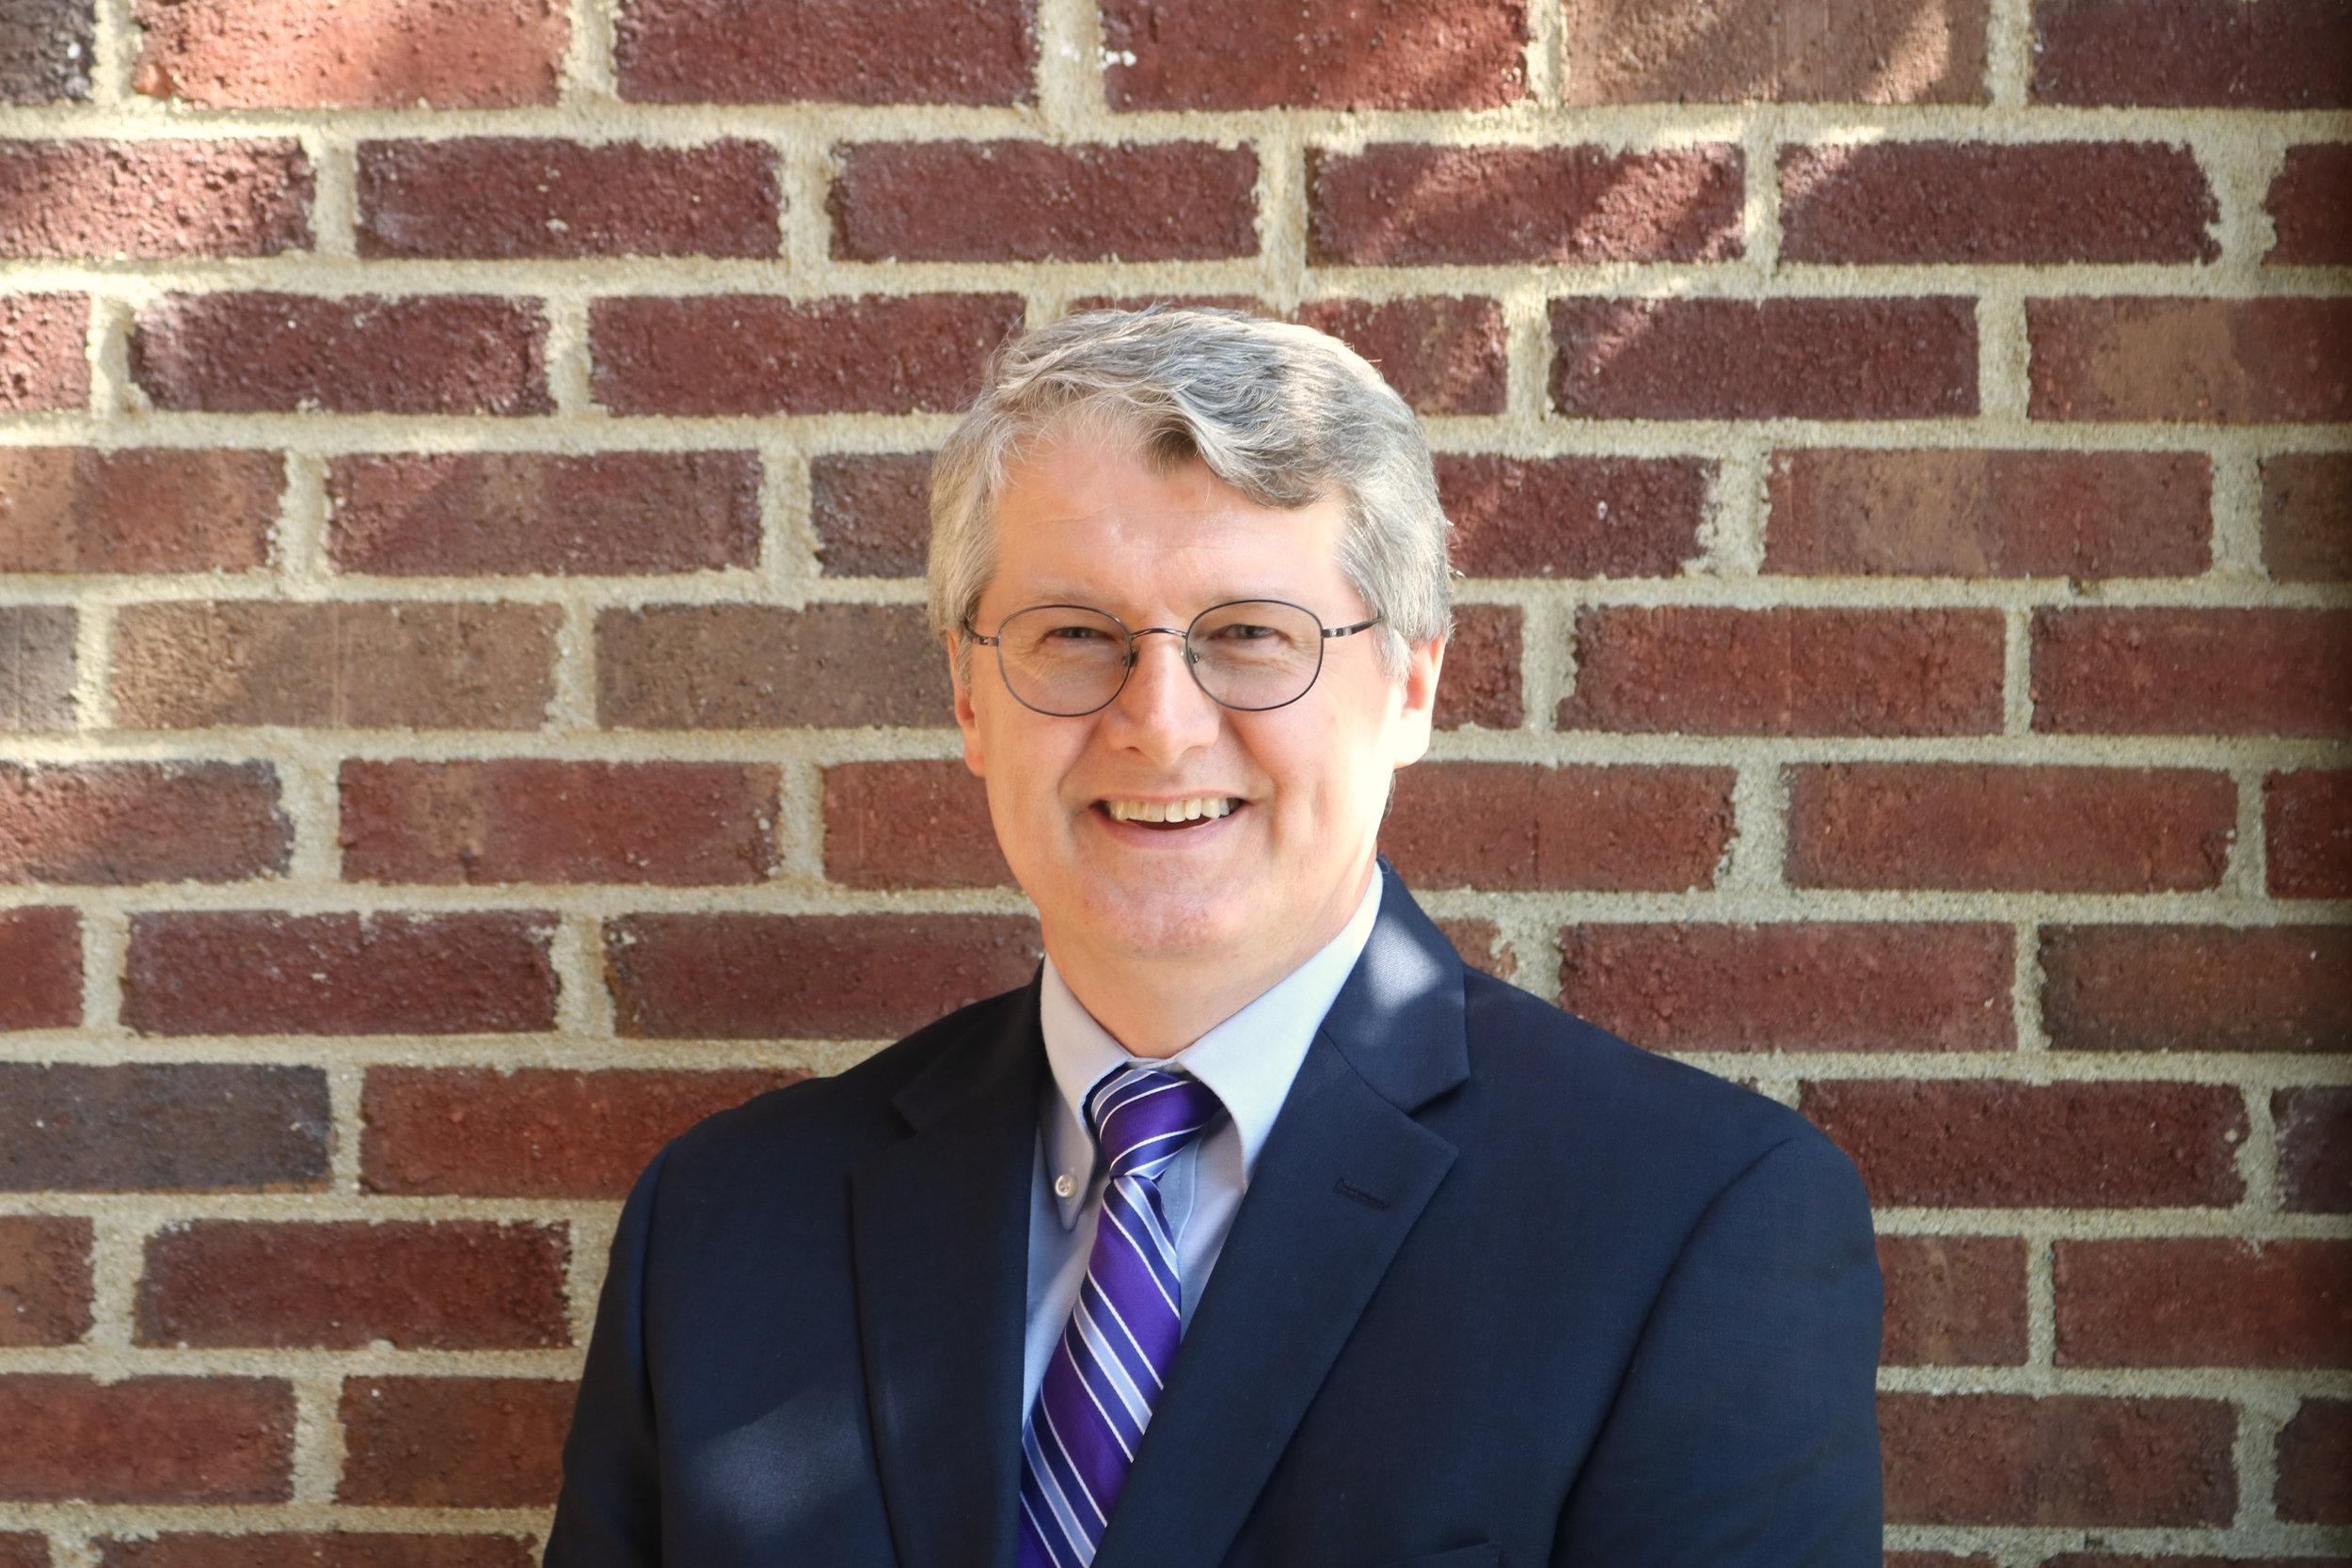 Rick Woodruff, Technical Writing Manager